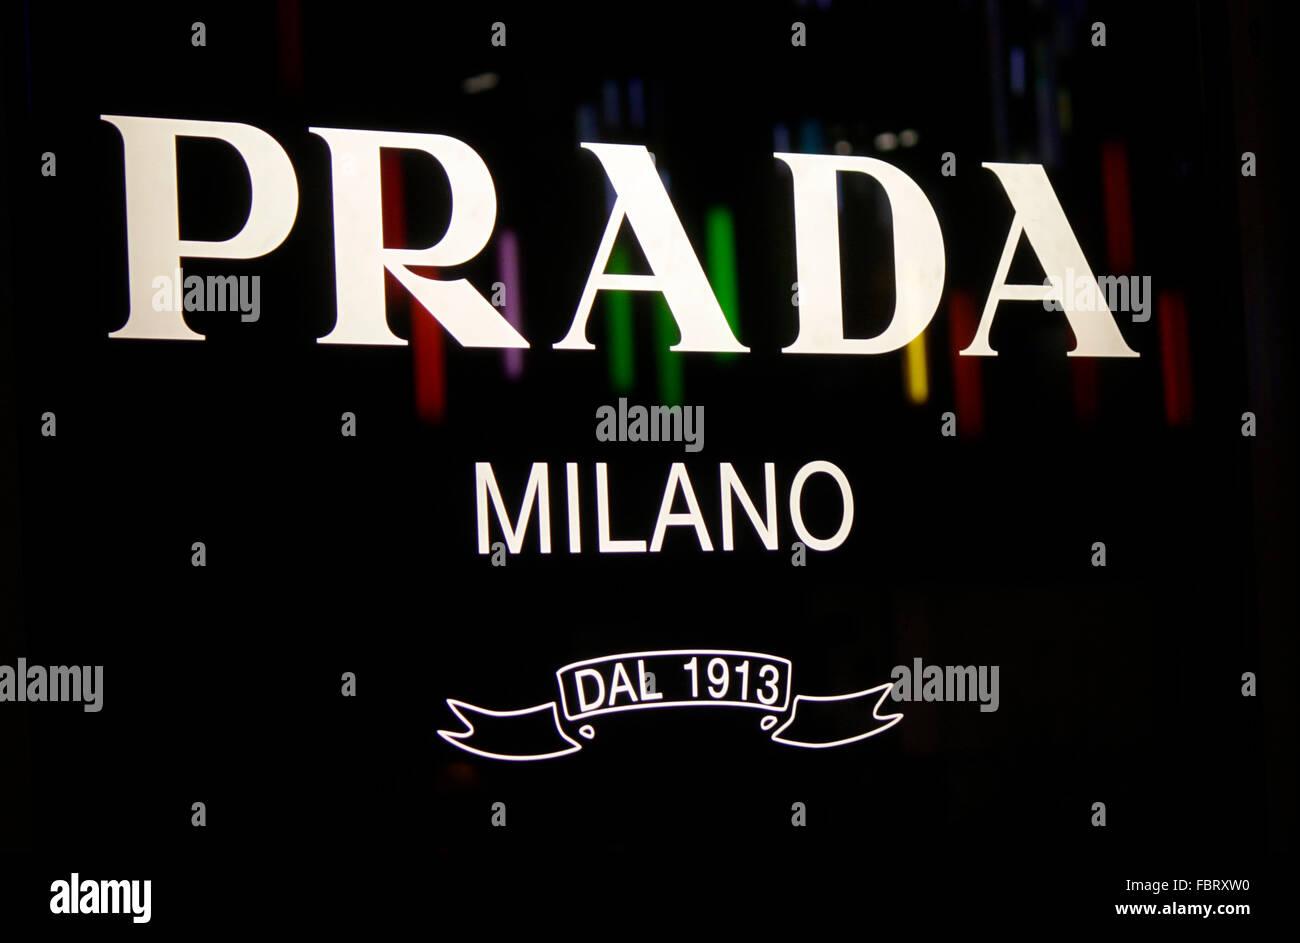 Markenname: 'Prada Milano', Berlin. - Stock Image